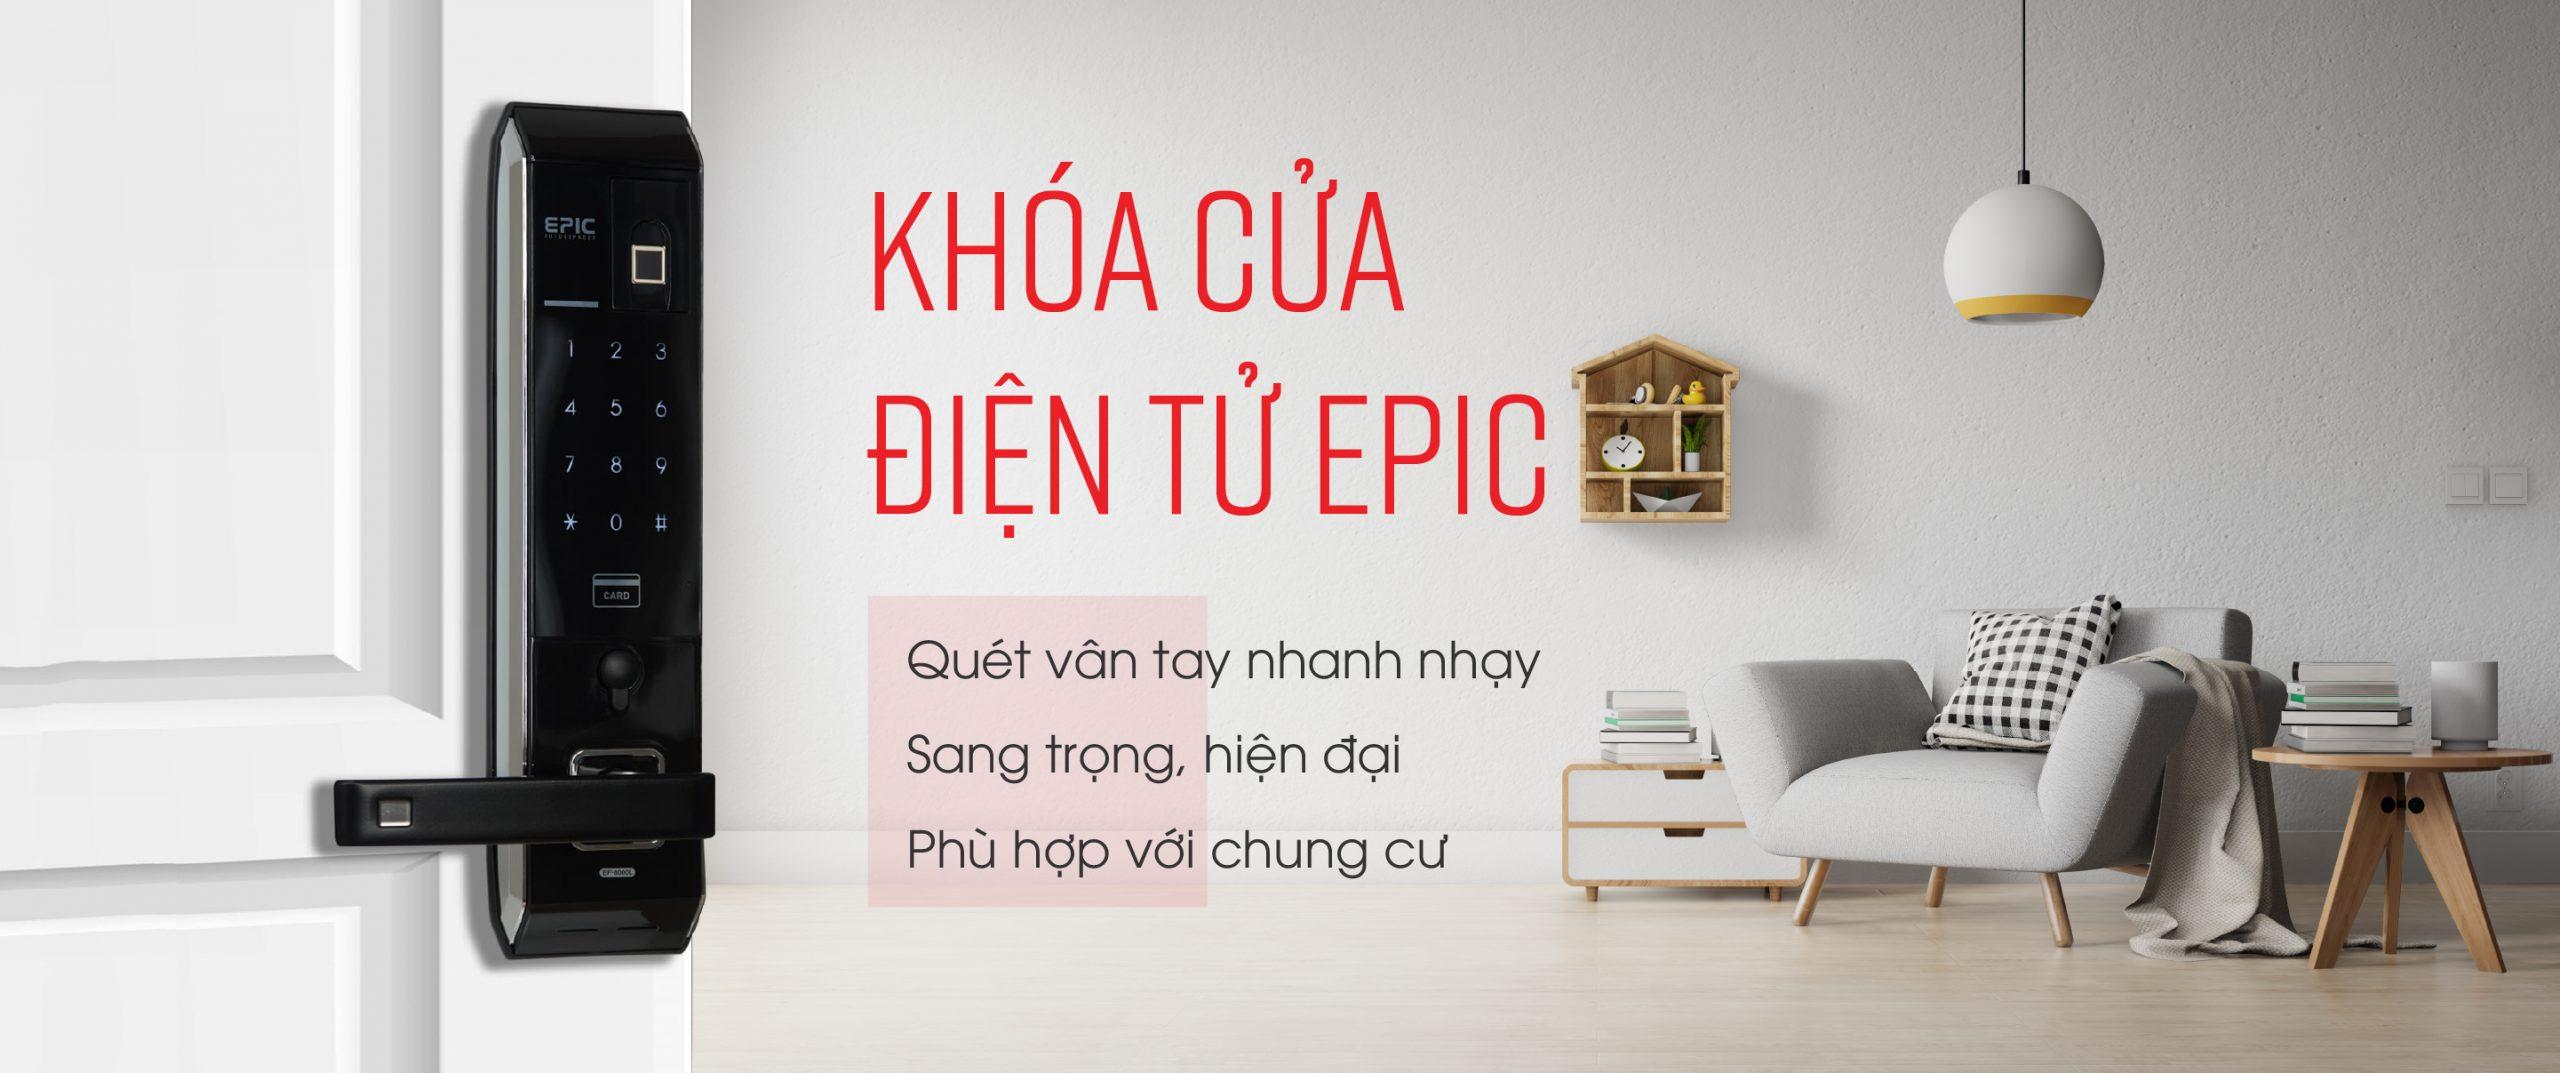 khoa-cua-dien-tu-epic